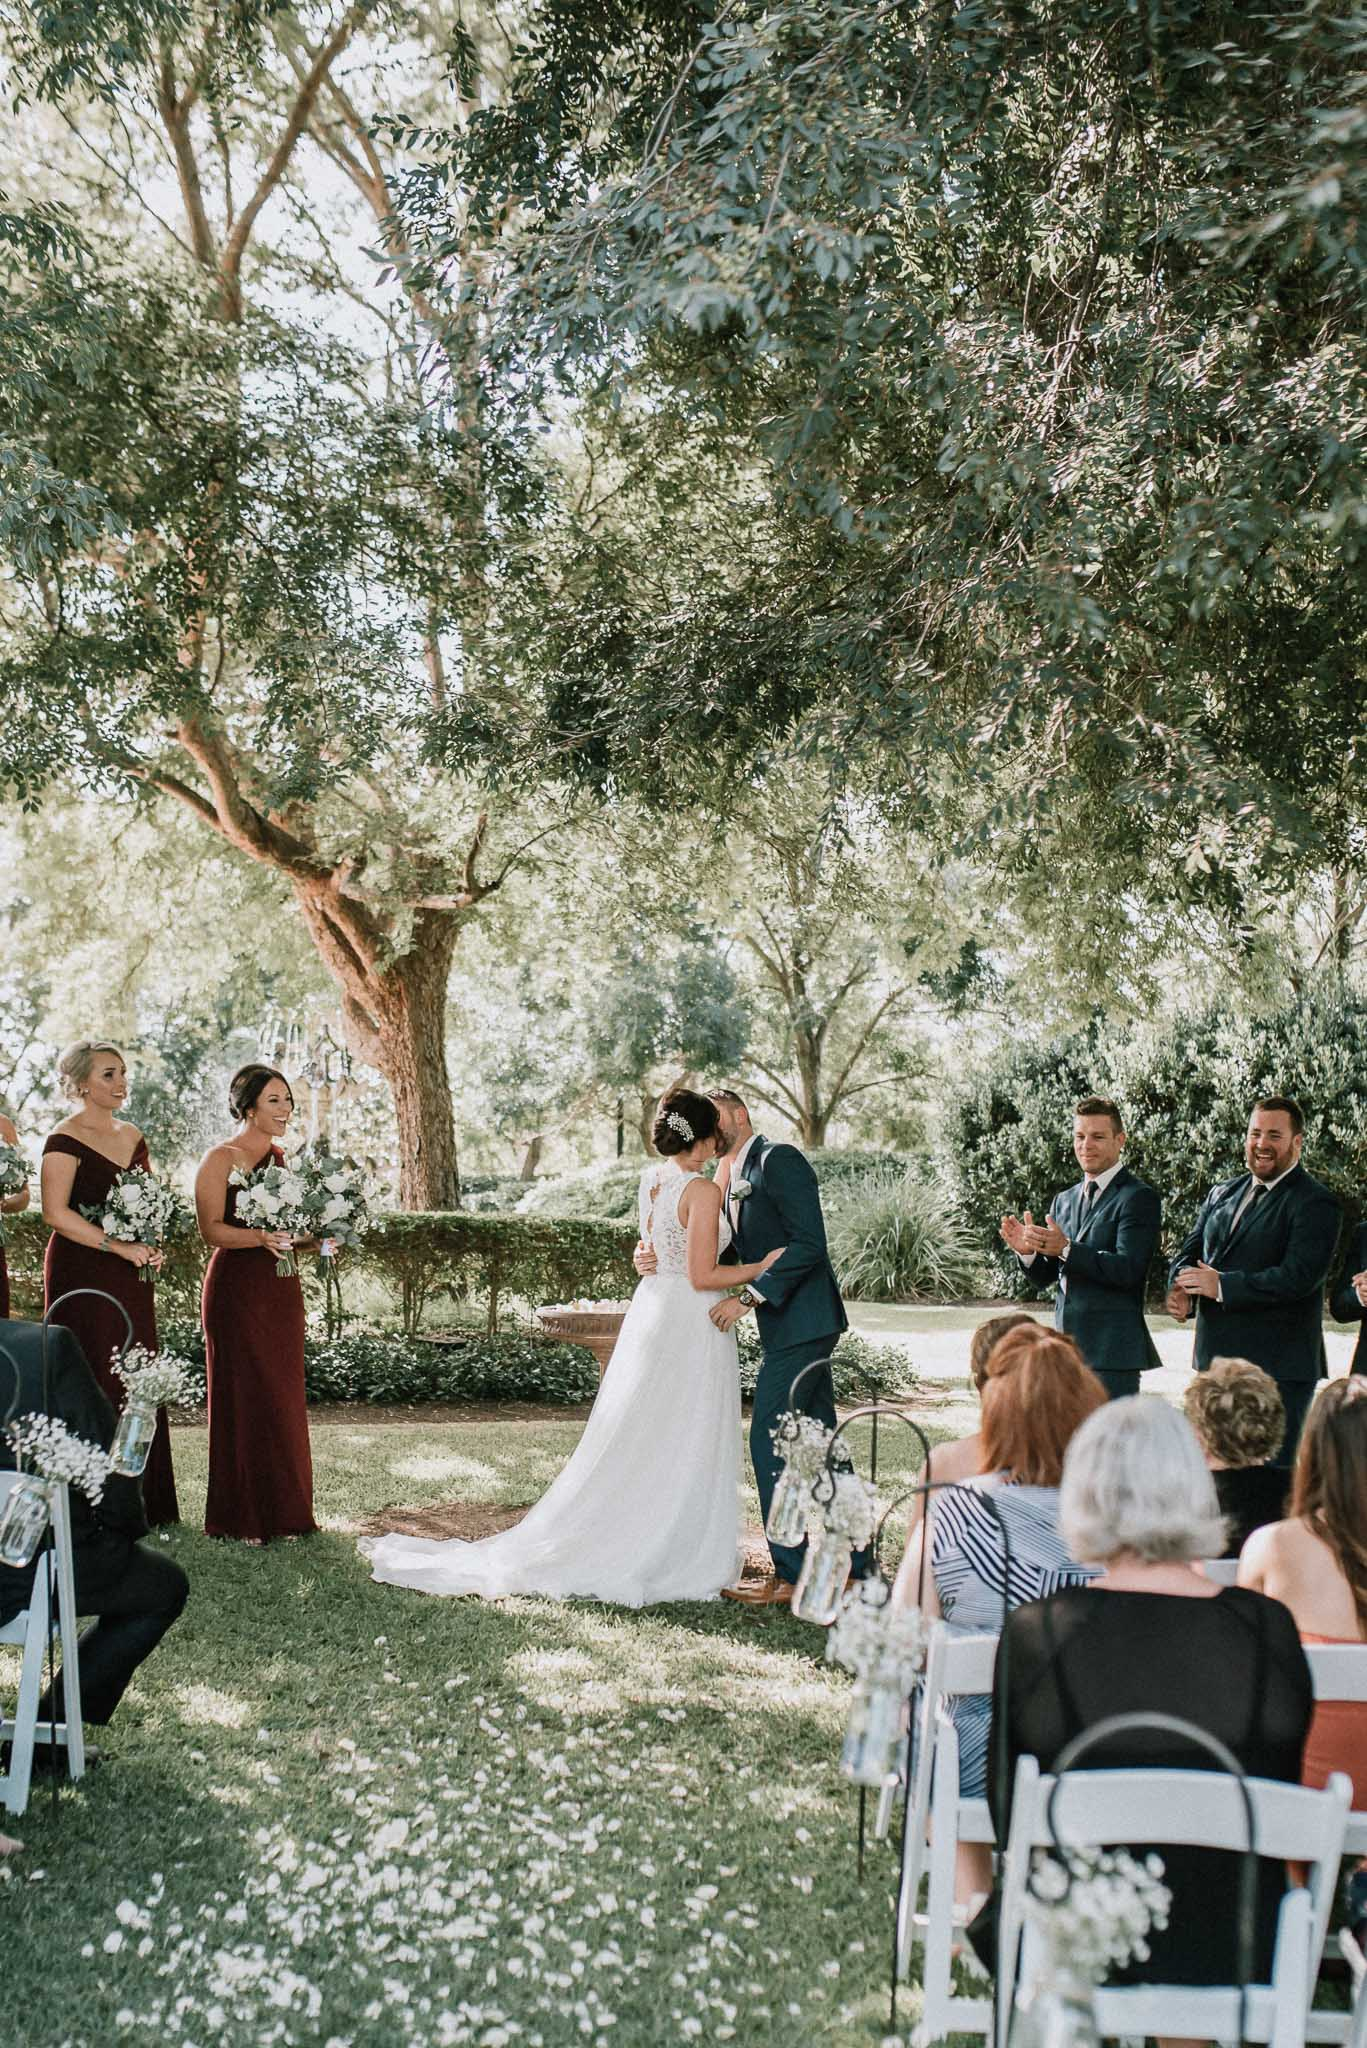 MECURE-RESORT-WEDDING-KING-WEB-69.jpg